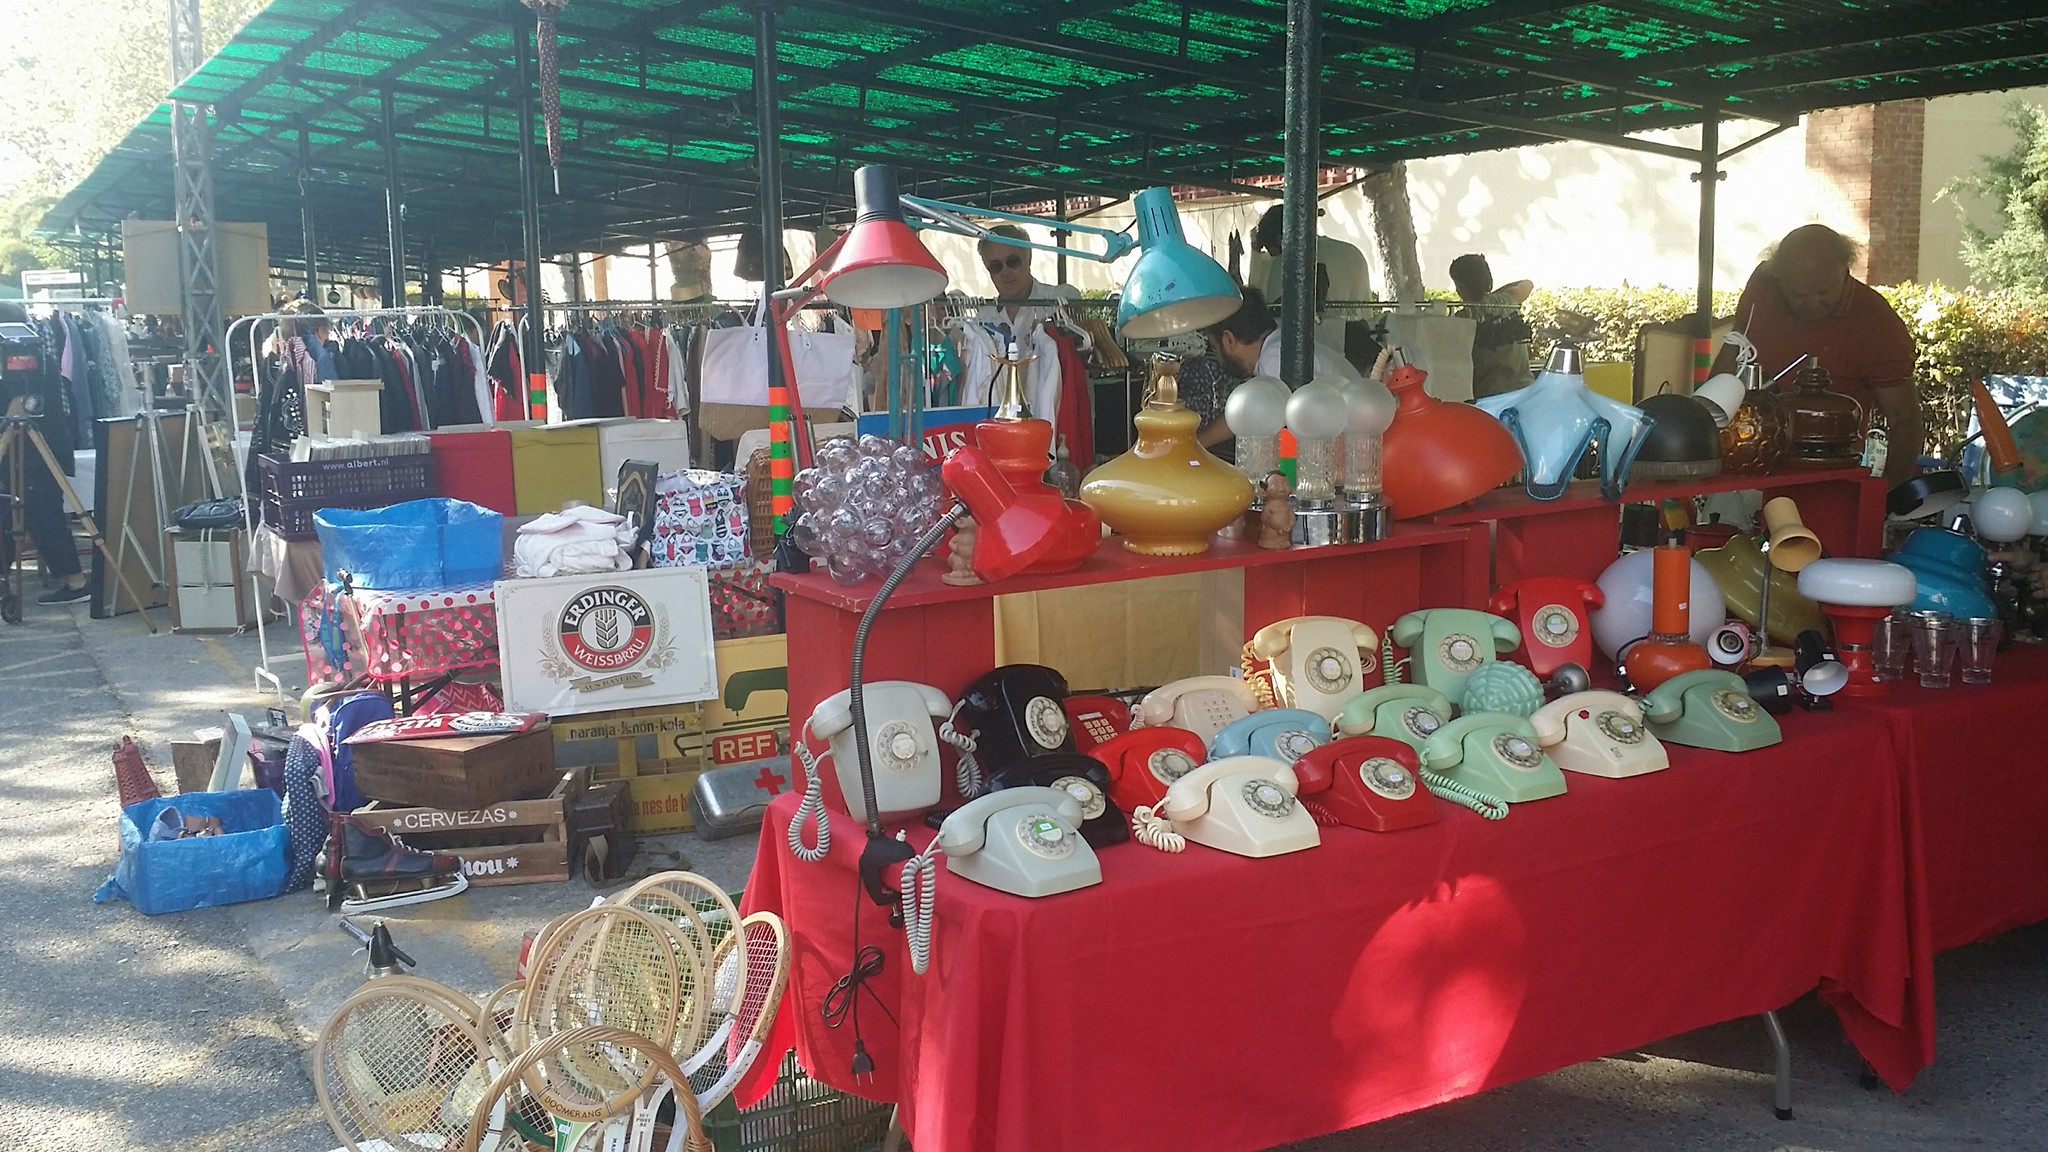 Outdoor goods for sale   © Mercado de Motores